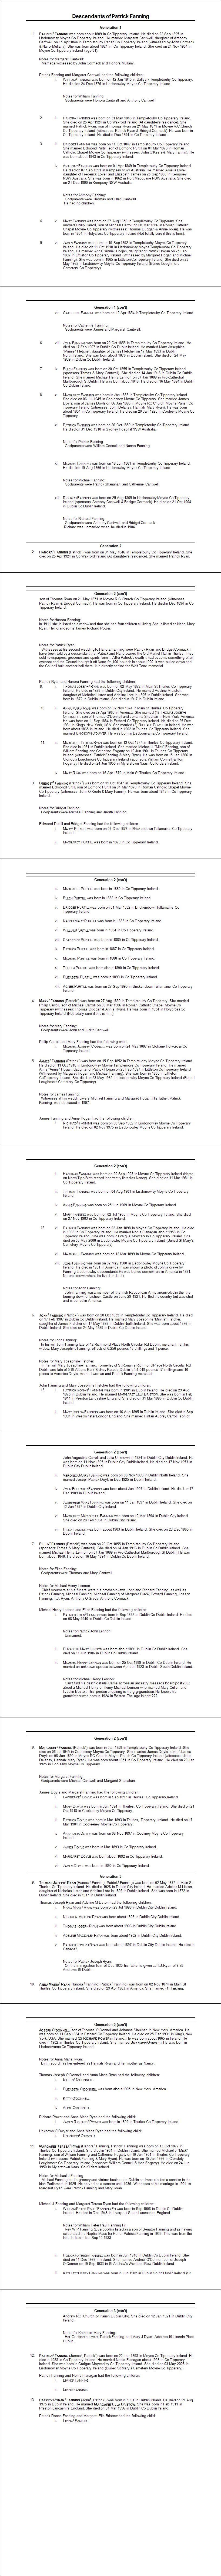 Patrick Fanning Lisdonowley Descendant Report 2015